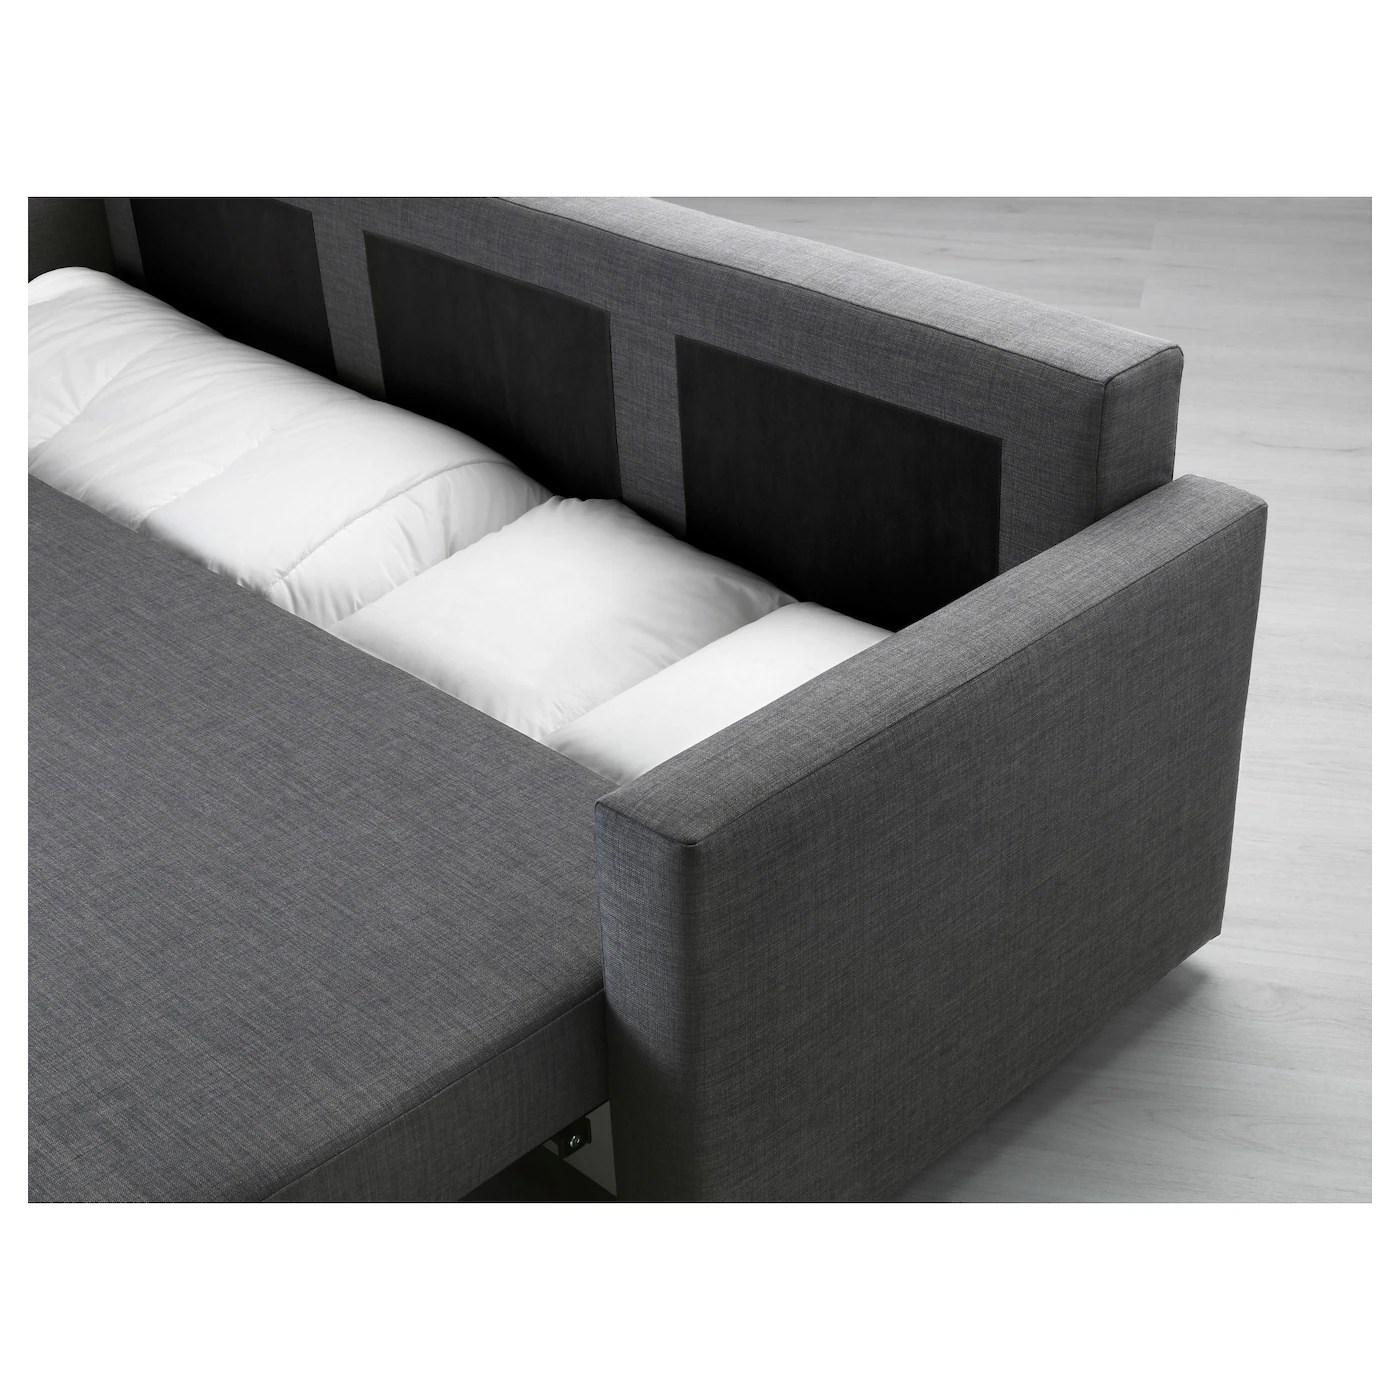 friheten corner sofa bed skiftebo beige sofas and armchairs uk 3 zitsslaapbank donkergrijs ikea